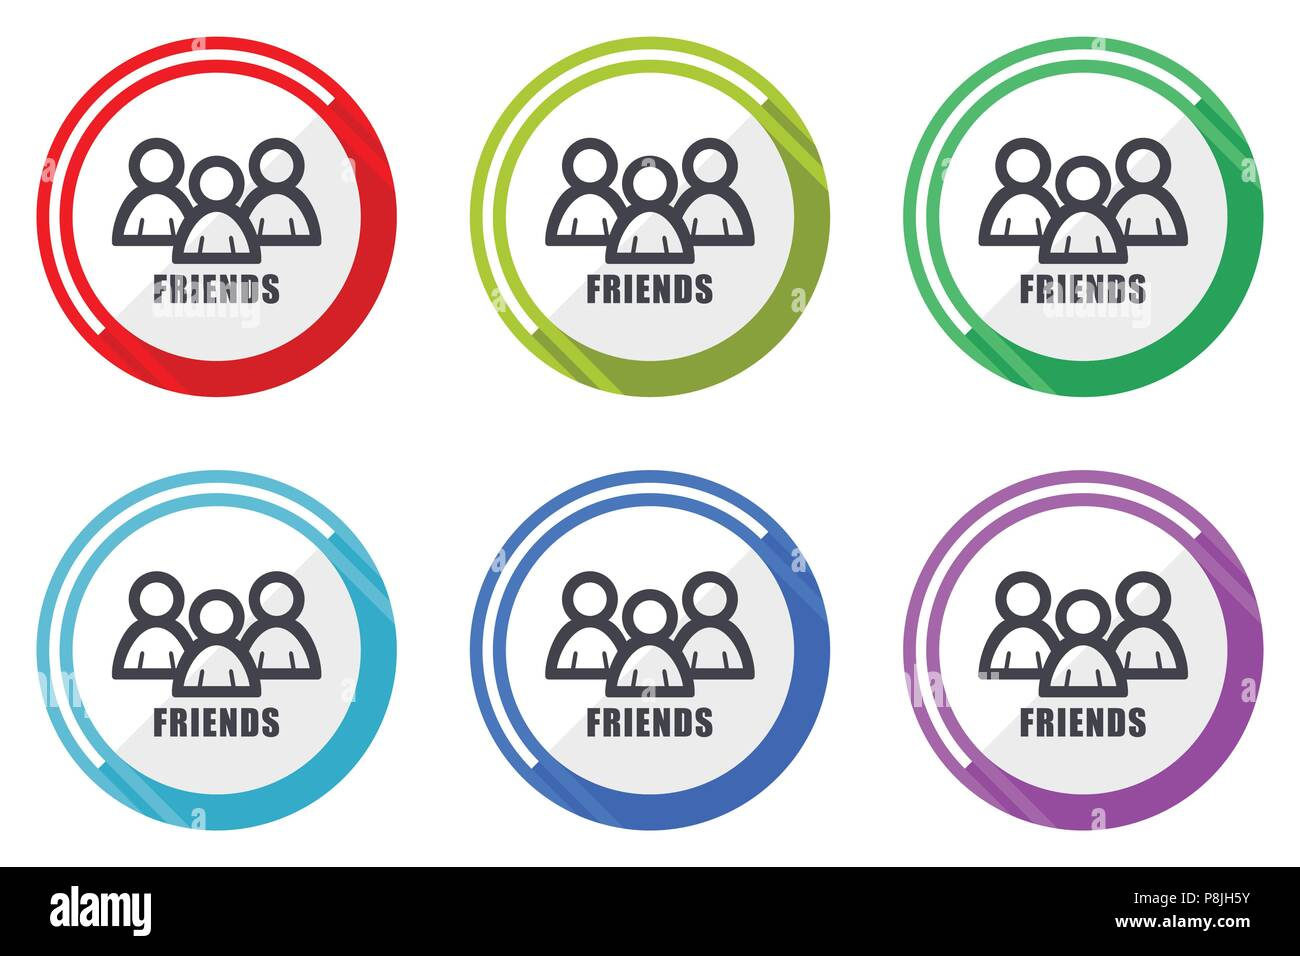 Friends Vector Icons Set Of Colorful Flat Design Internet Symbols